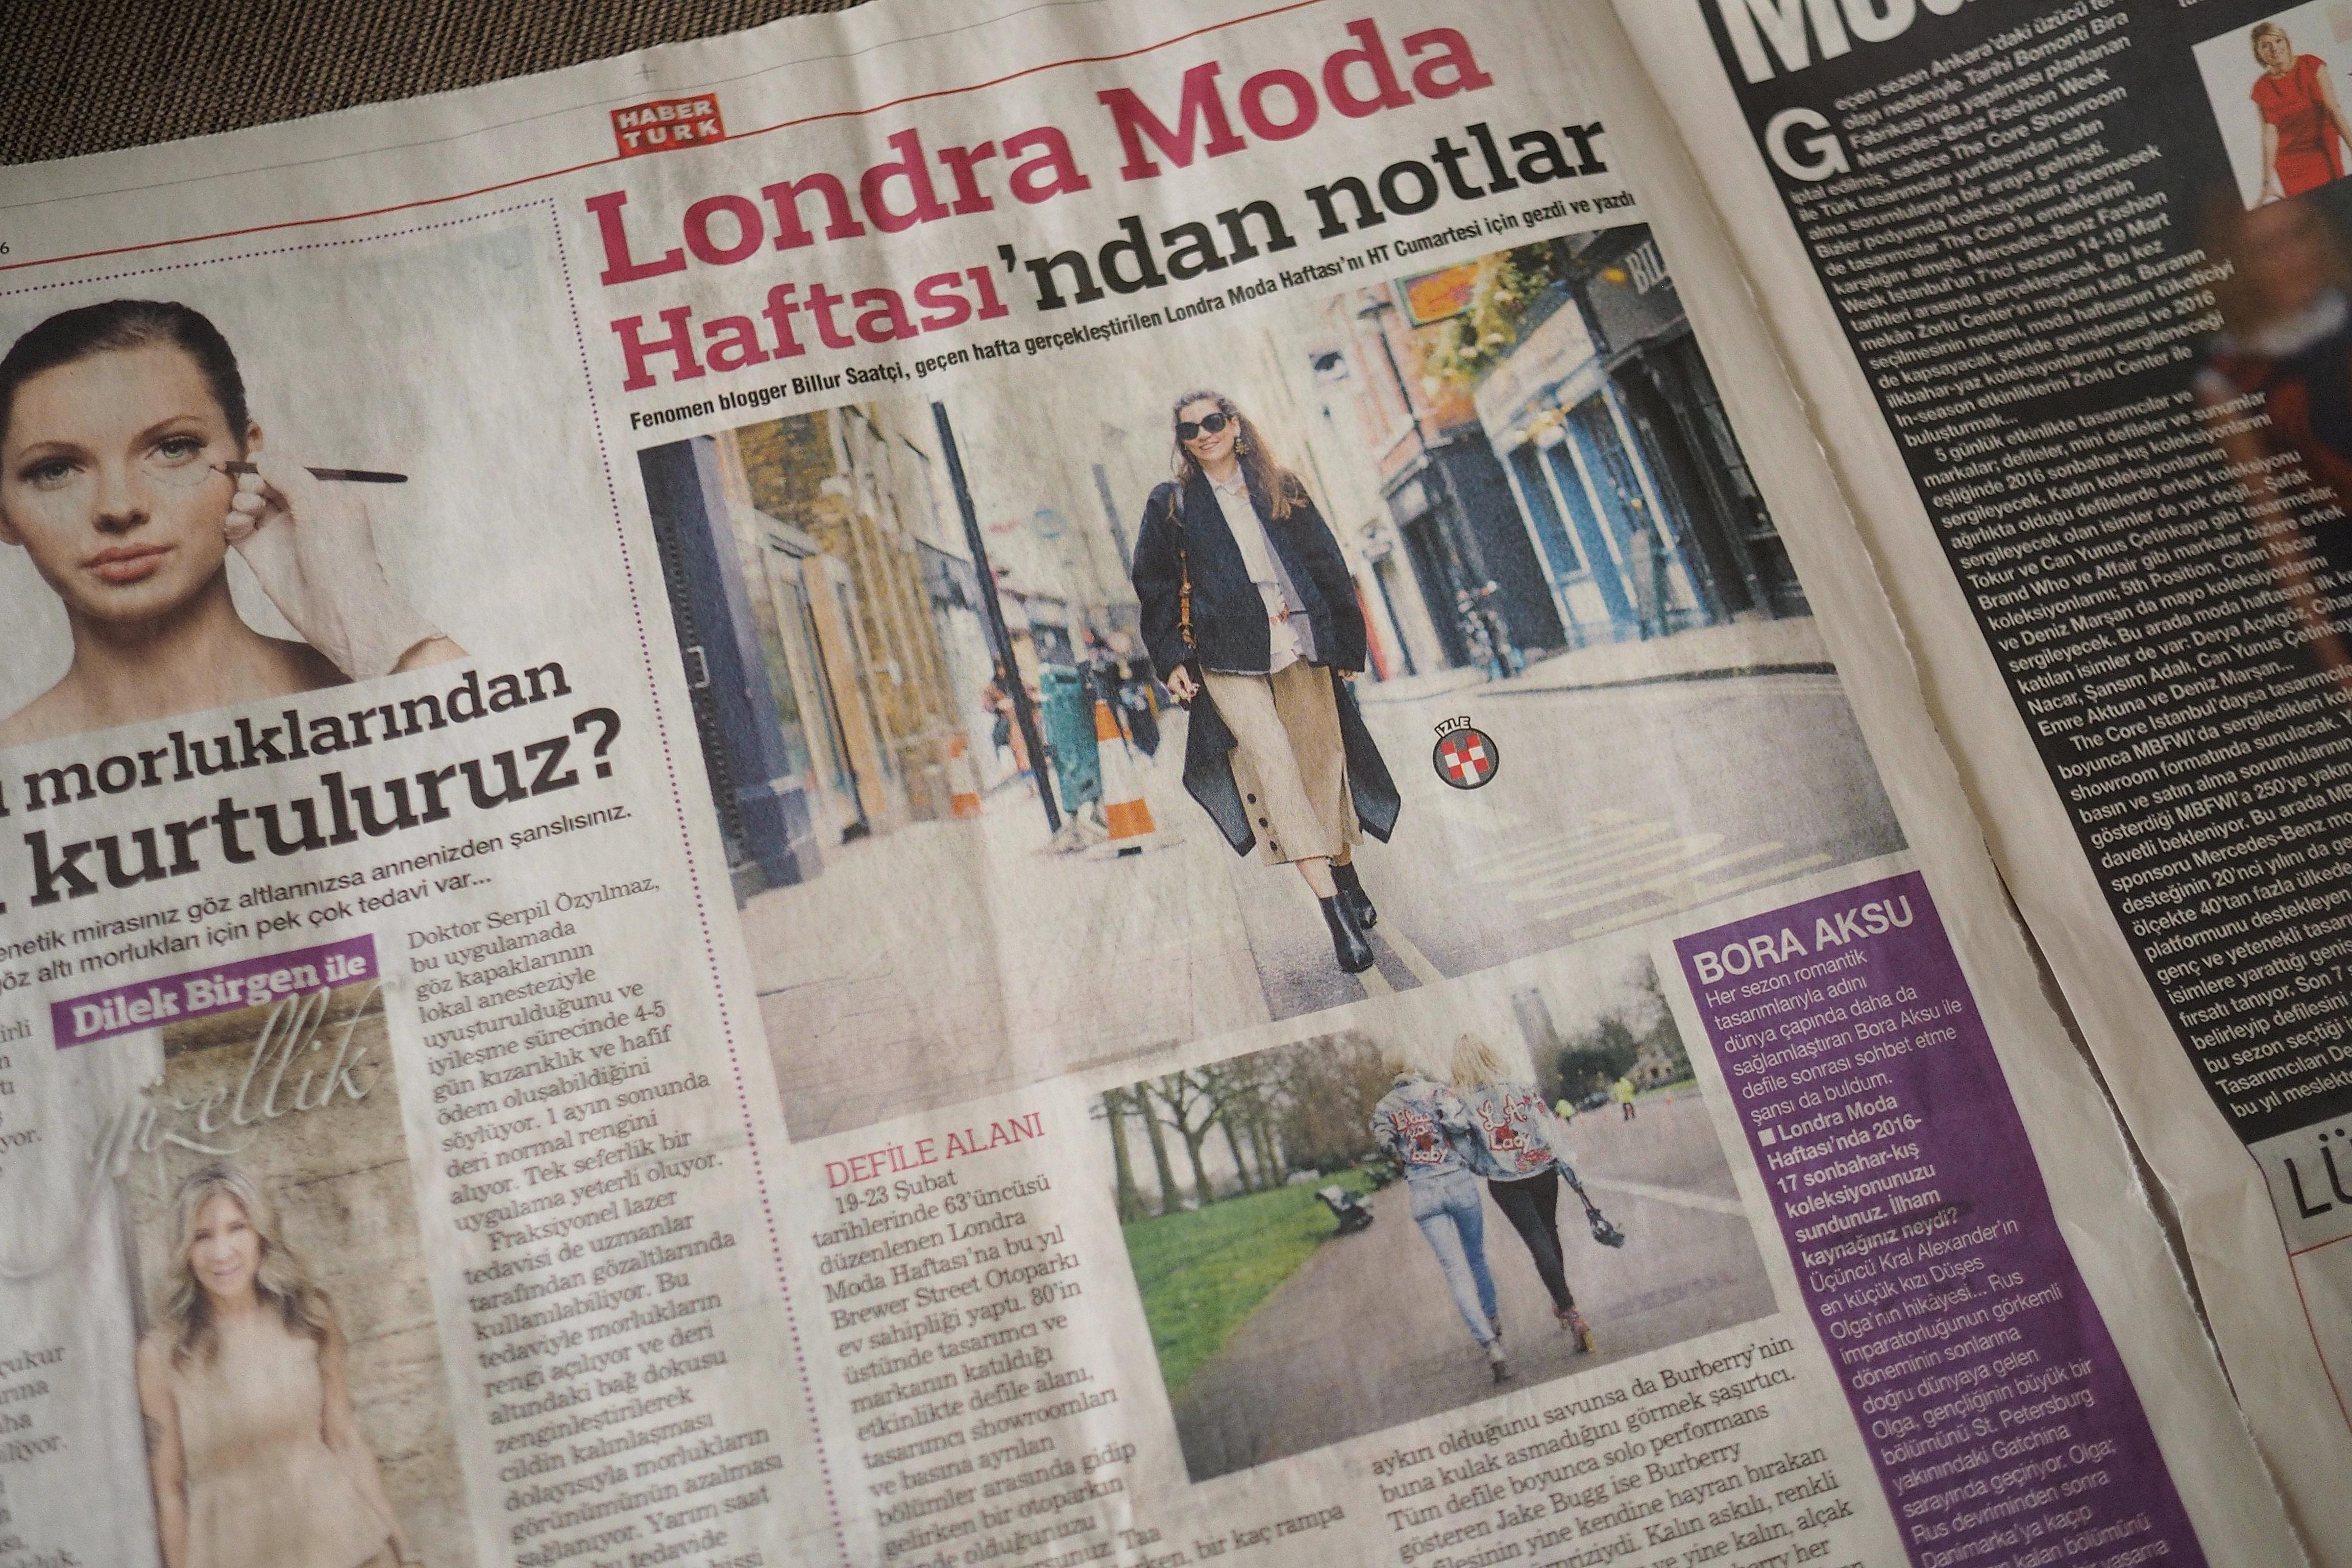 billur saatci, street style, mbfwi, off ne giysem, turkish style blogger, mercedes benz fashion week istanbul, mbfwi, habertürk, bora aksu röportaj